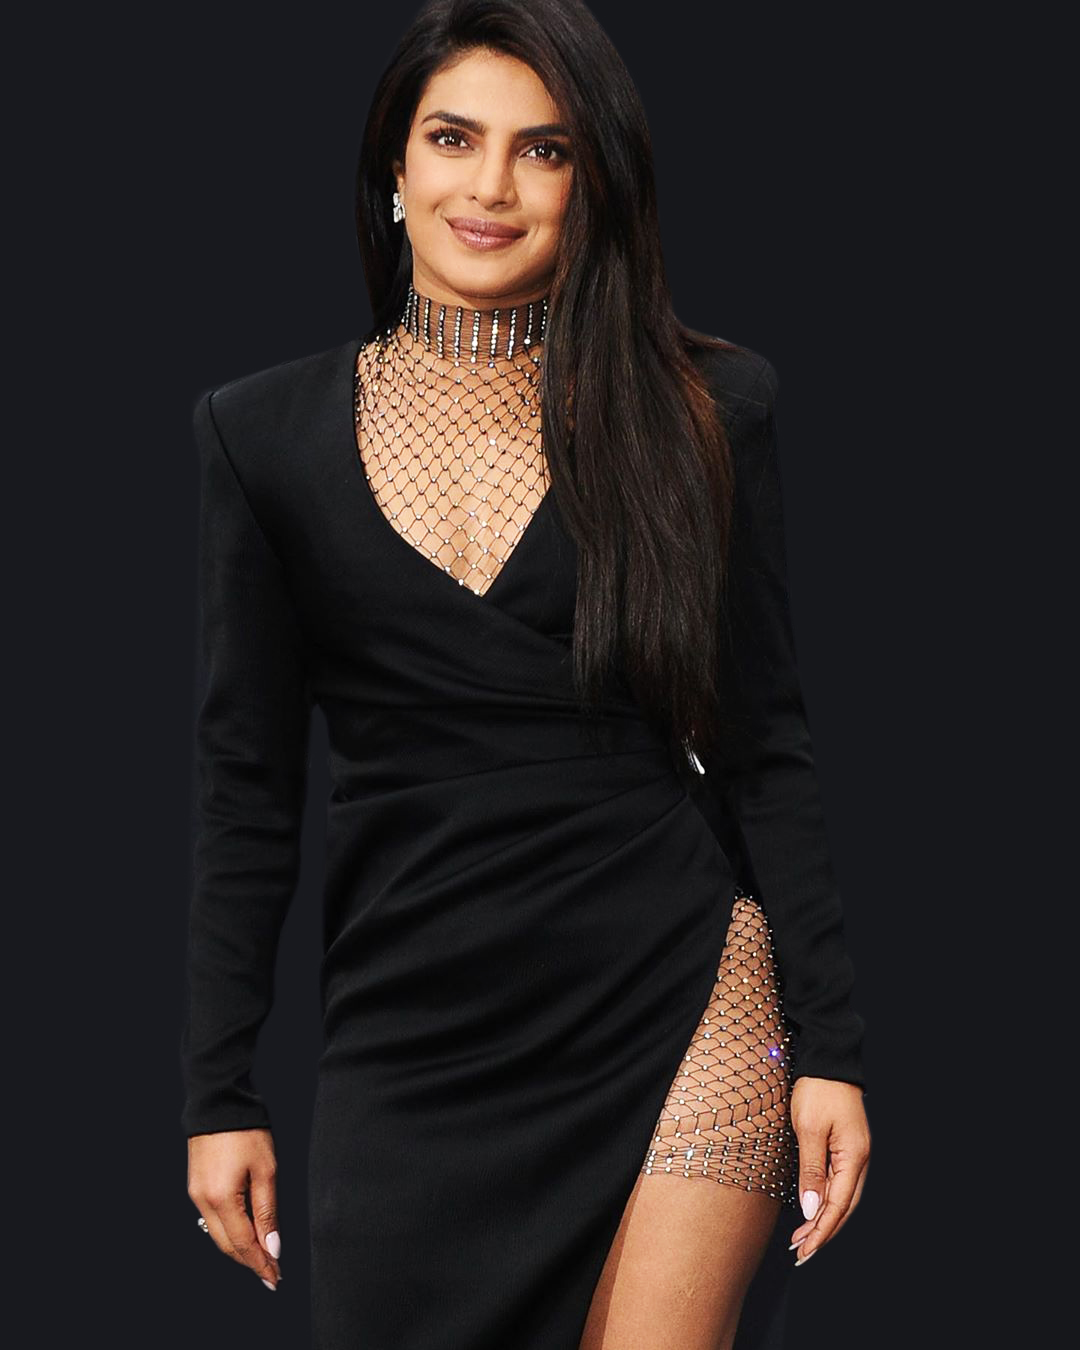 Bollywood Tadka, प्रियंका चोपडा़ इमेज, प्रियंका चोपडा़ फोटो, प्रियंका चोपडा़ पिक्चर